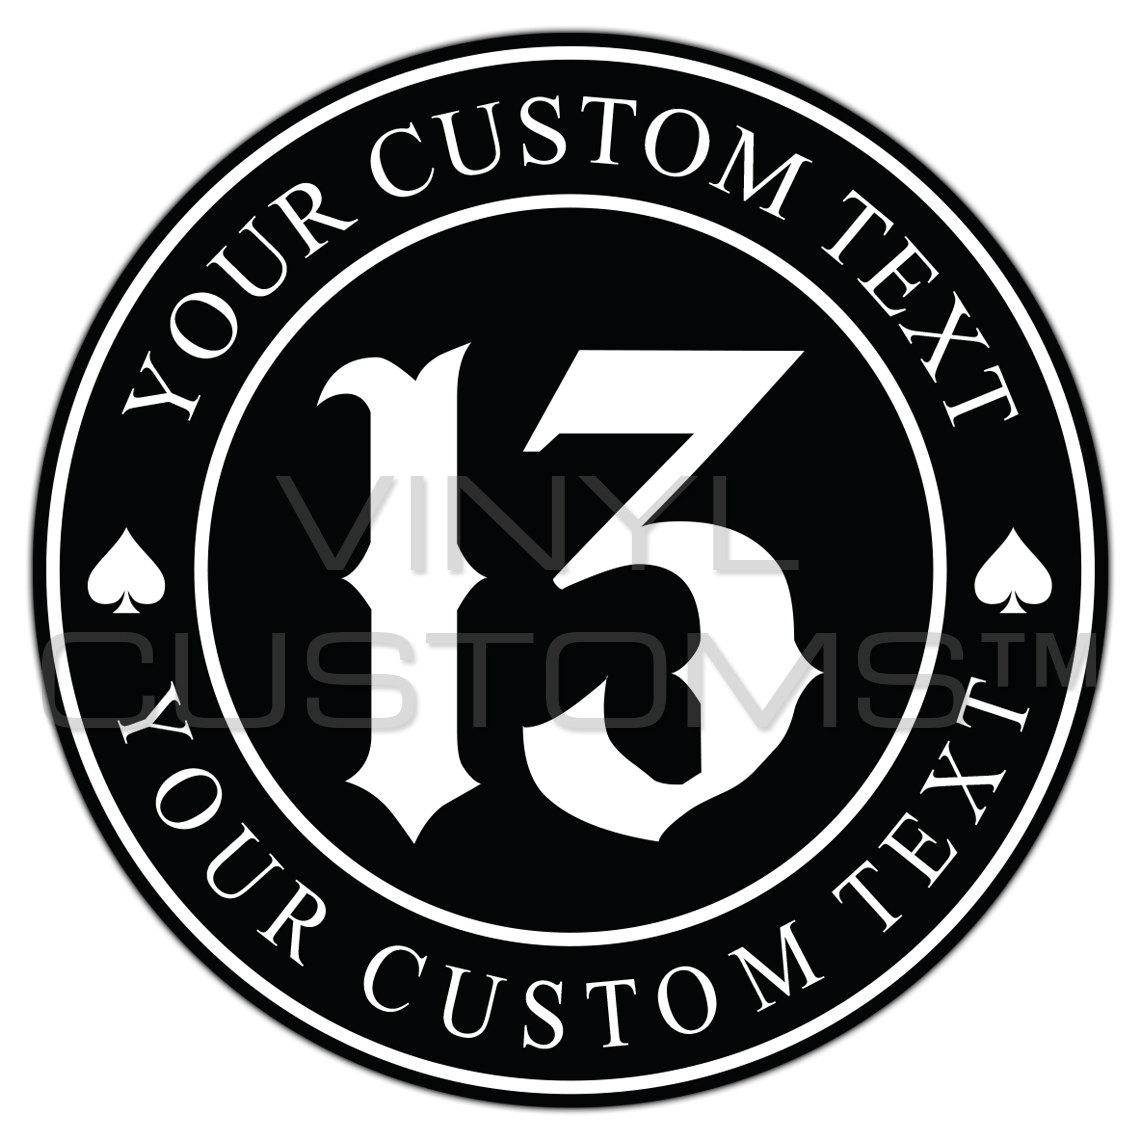 Custom Logo Vinyl Decal Sticker Lucky Number Spade Your - Custom logo vinyl decals